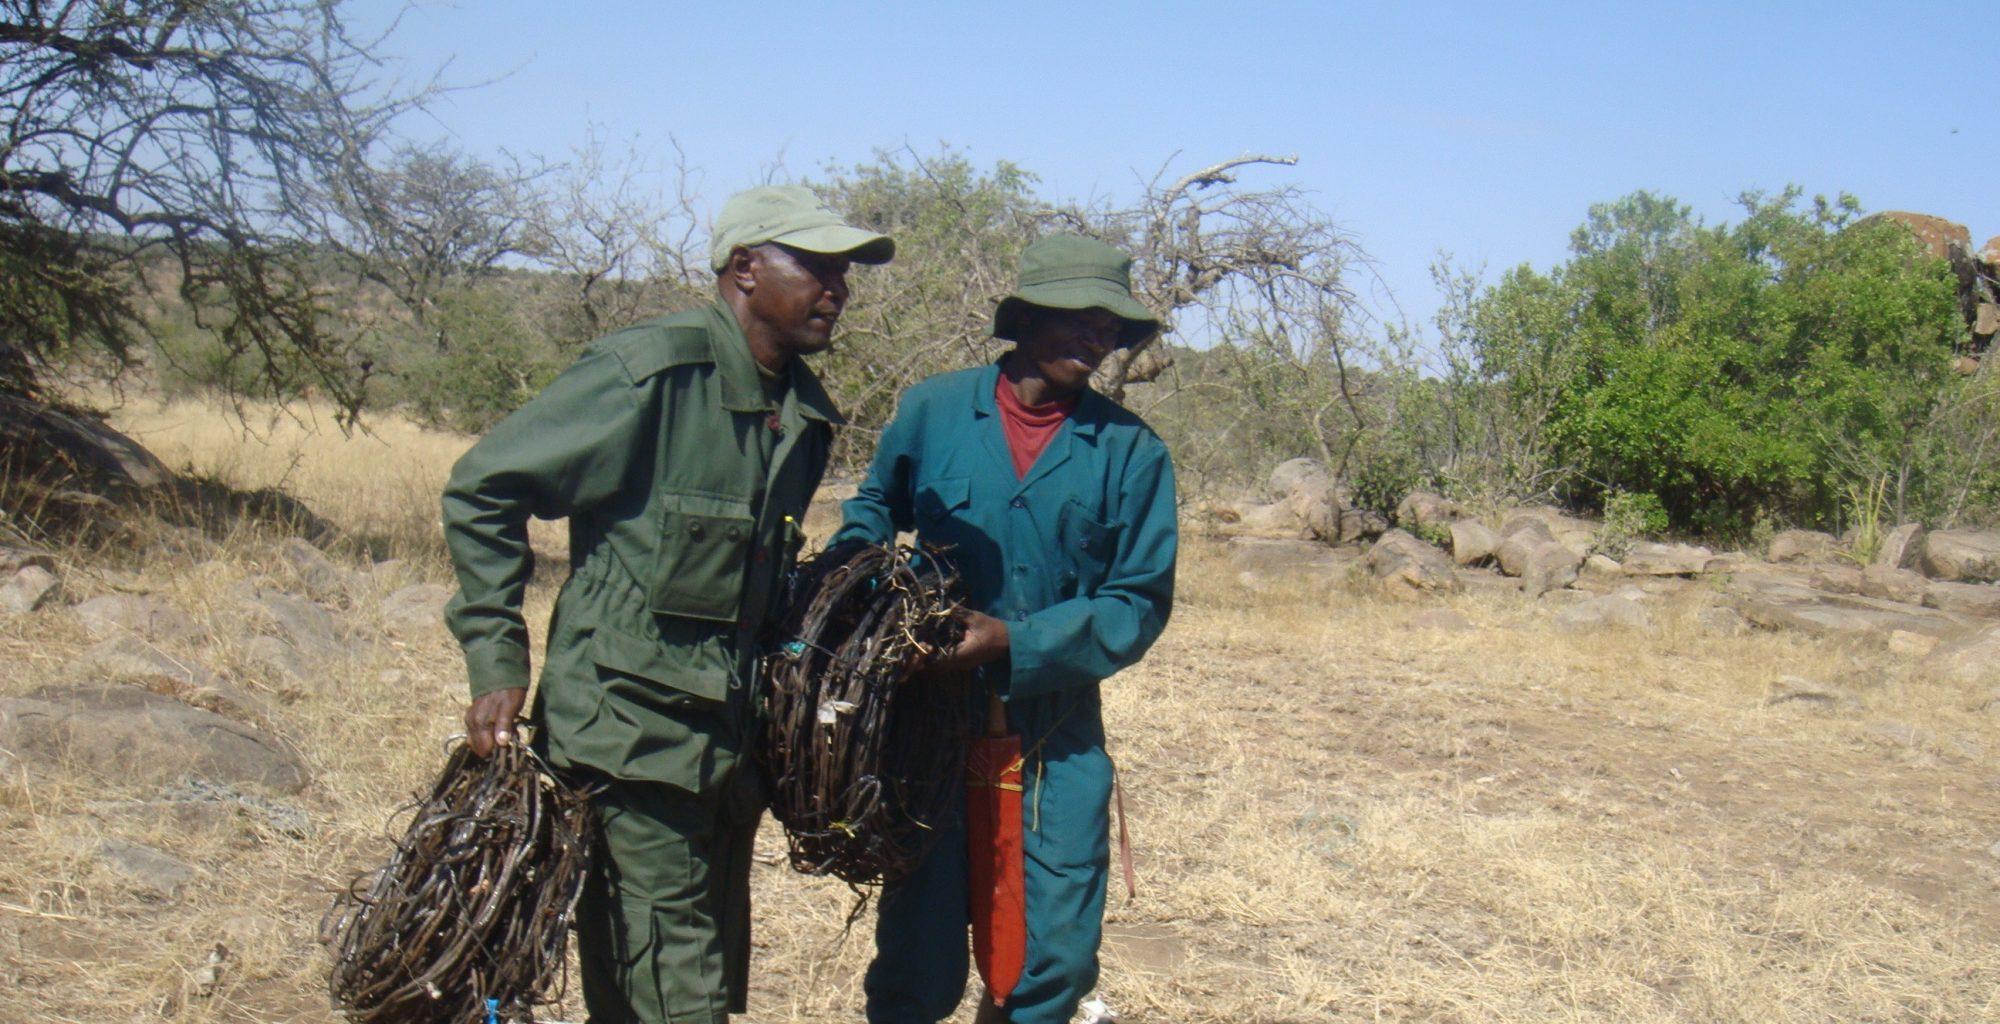 Nomad-Tanzania-Serengeti-De-Snaring